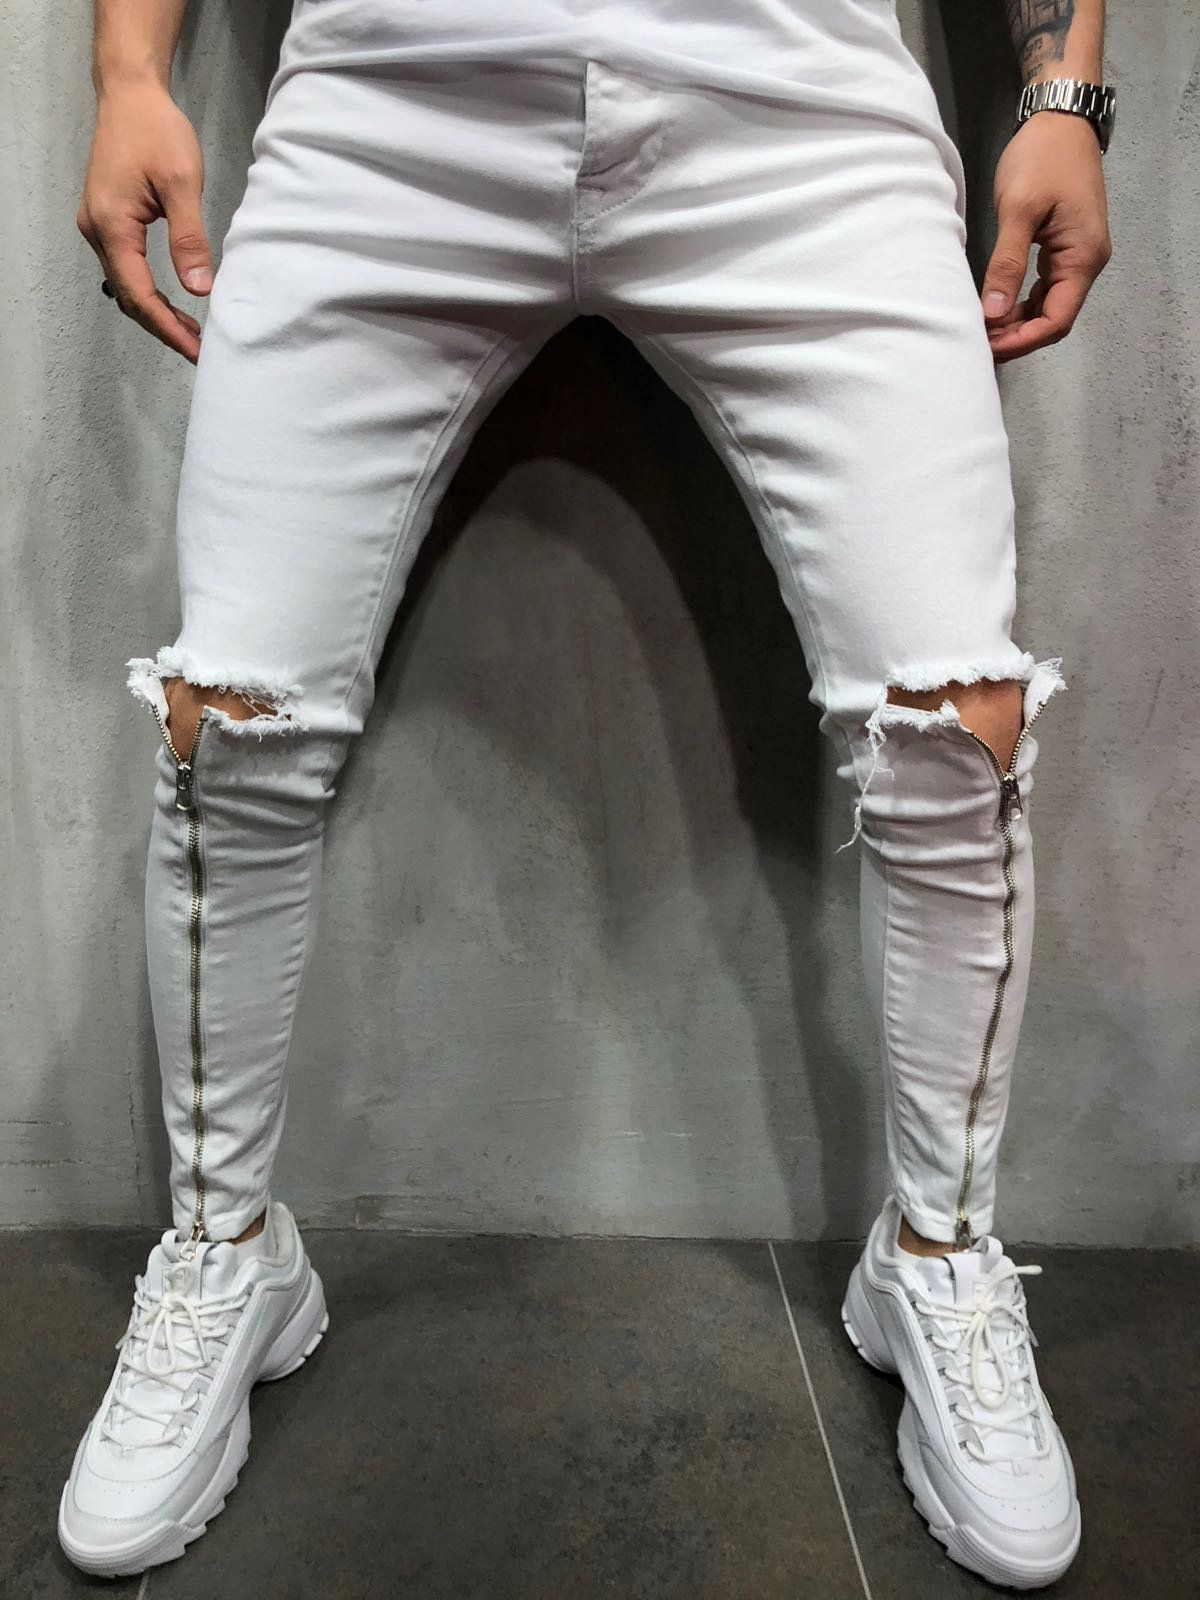 c6692837 Men Skinny Fit Ripped Knee Zipper Shins Short Ankle Jeans - White 3833